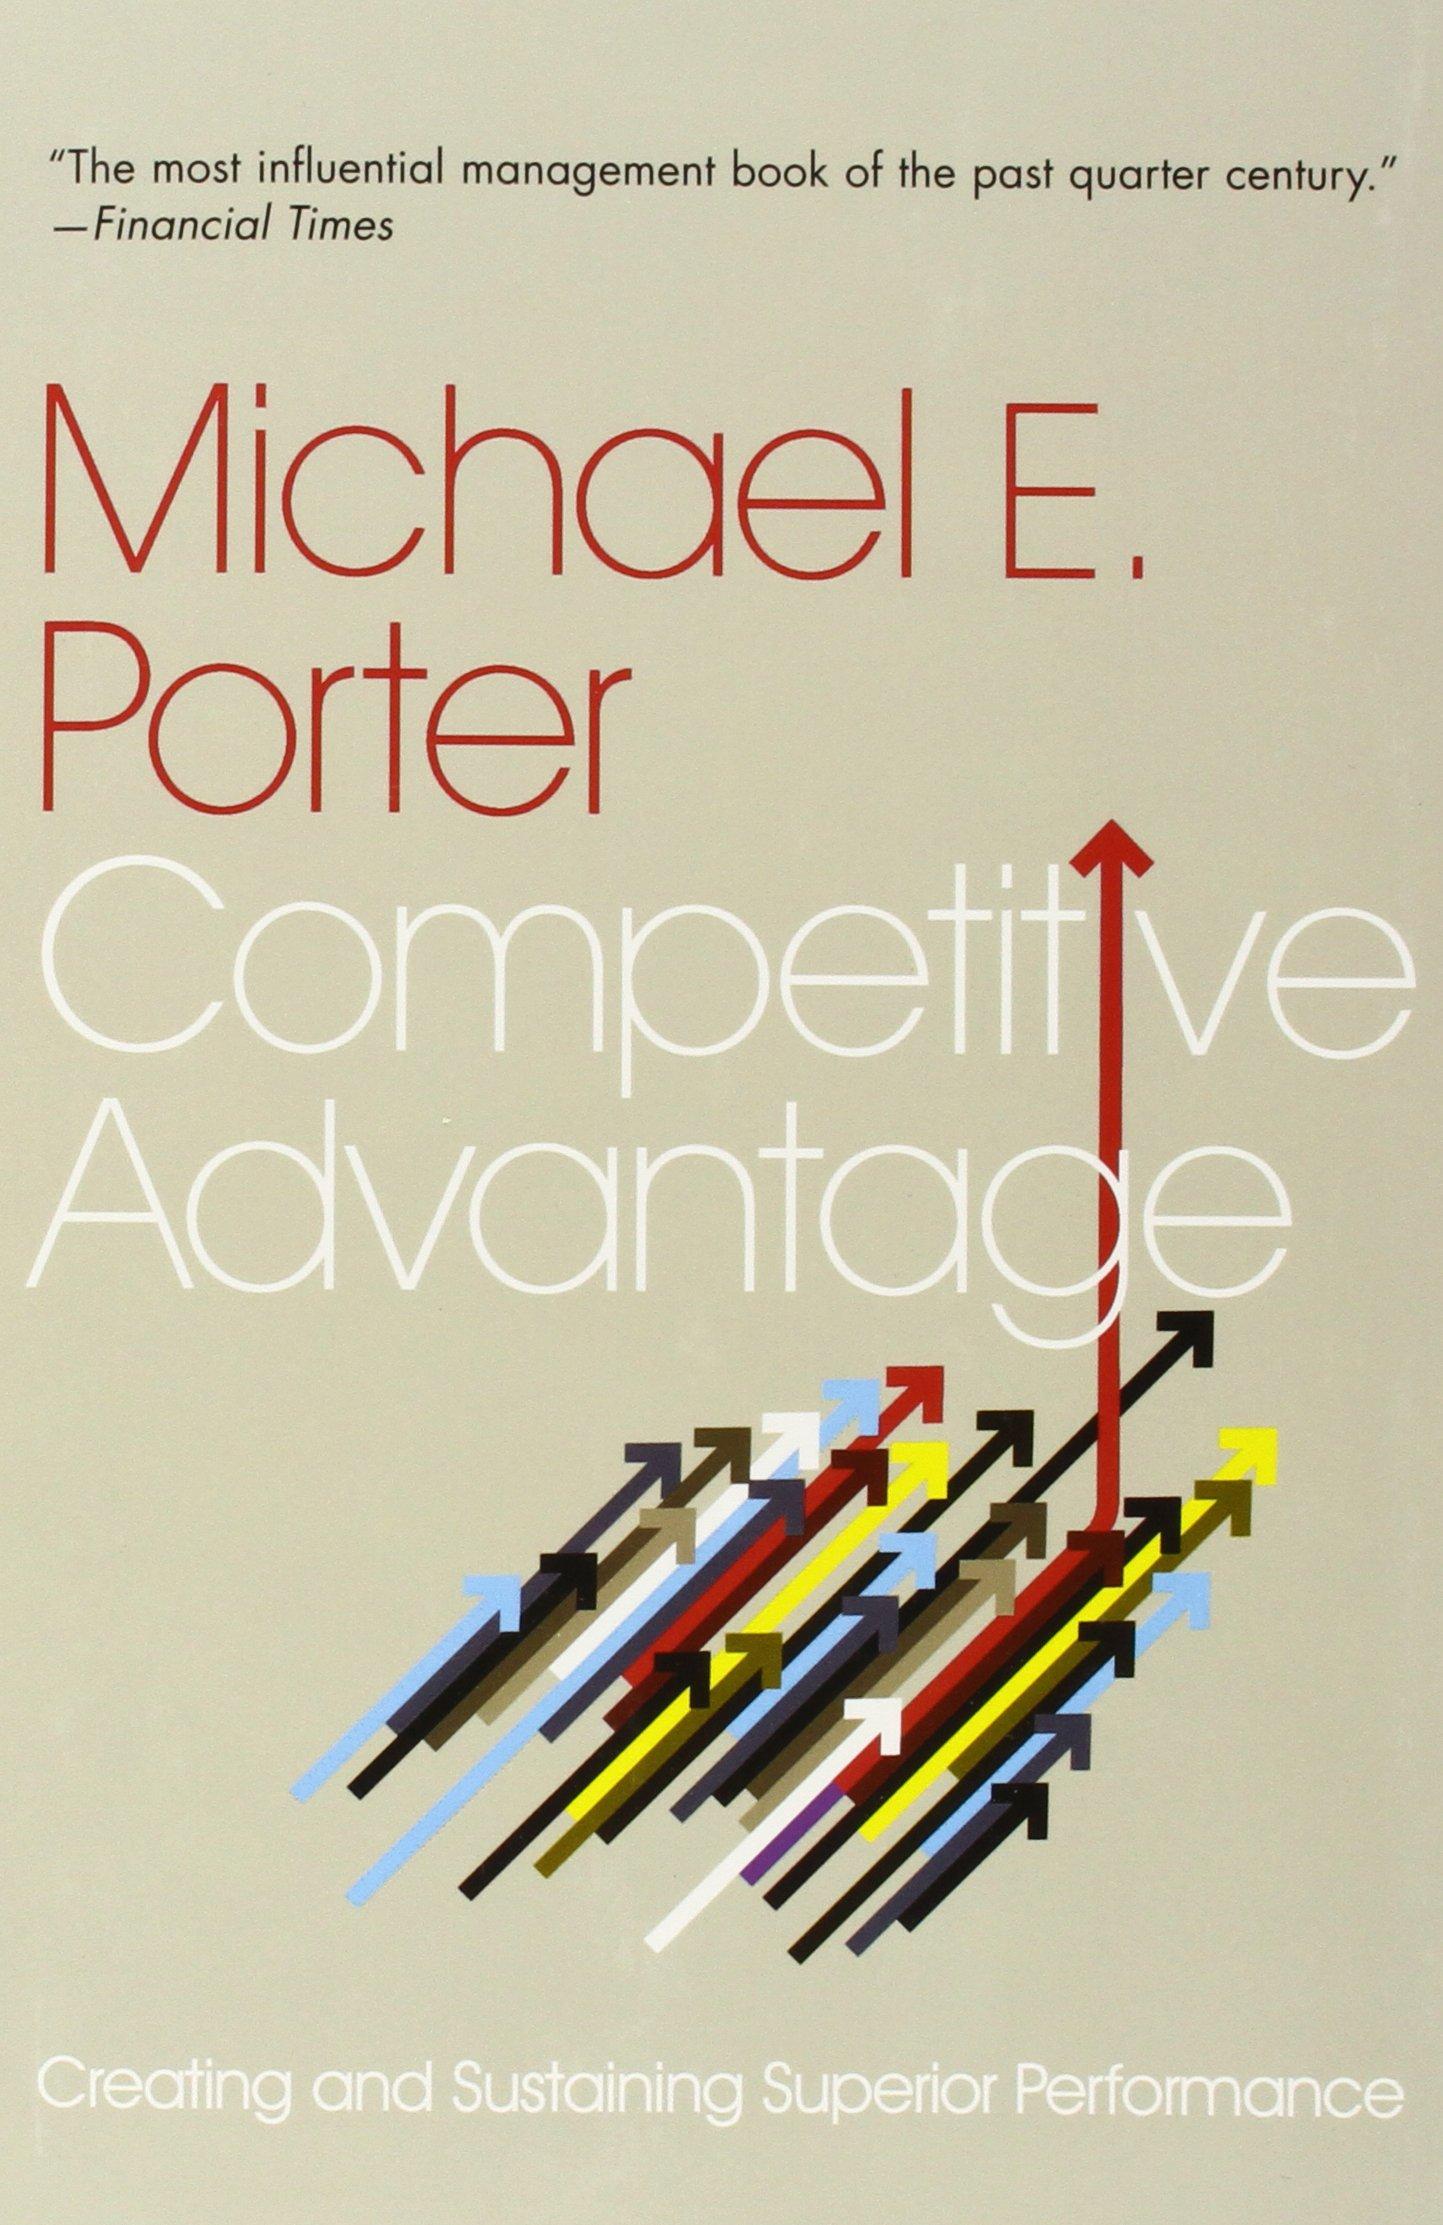 amazon competitive advantage michael e porter information